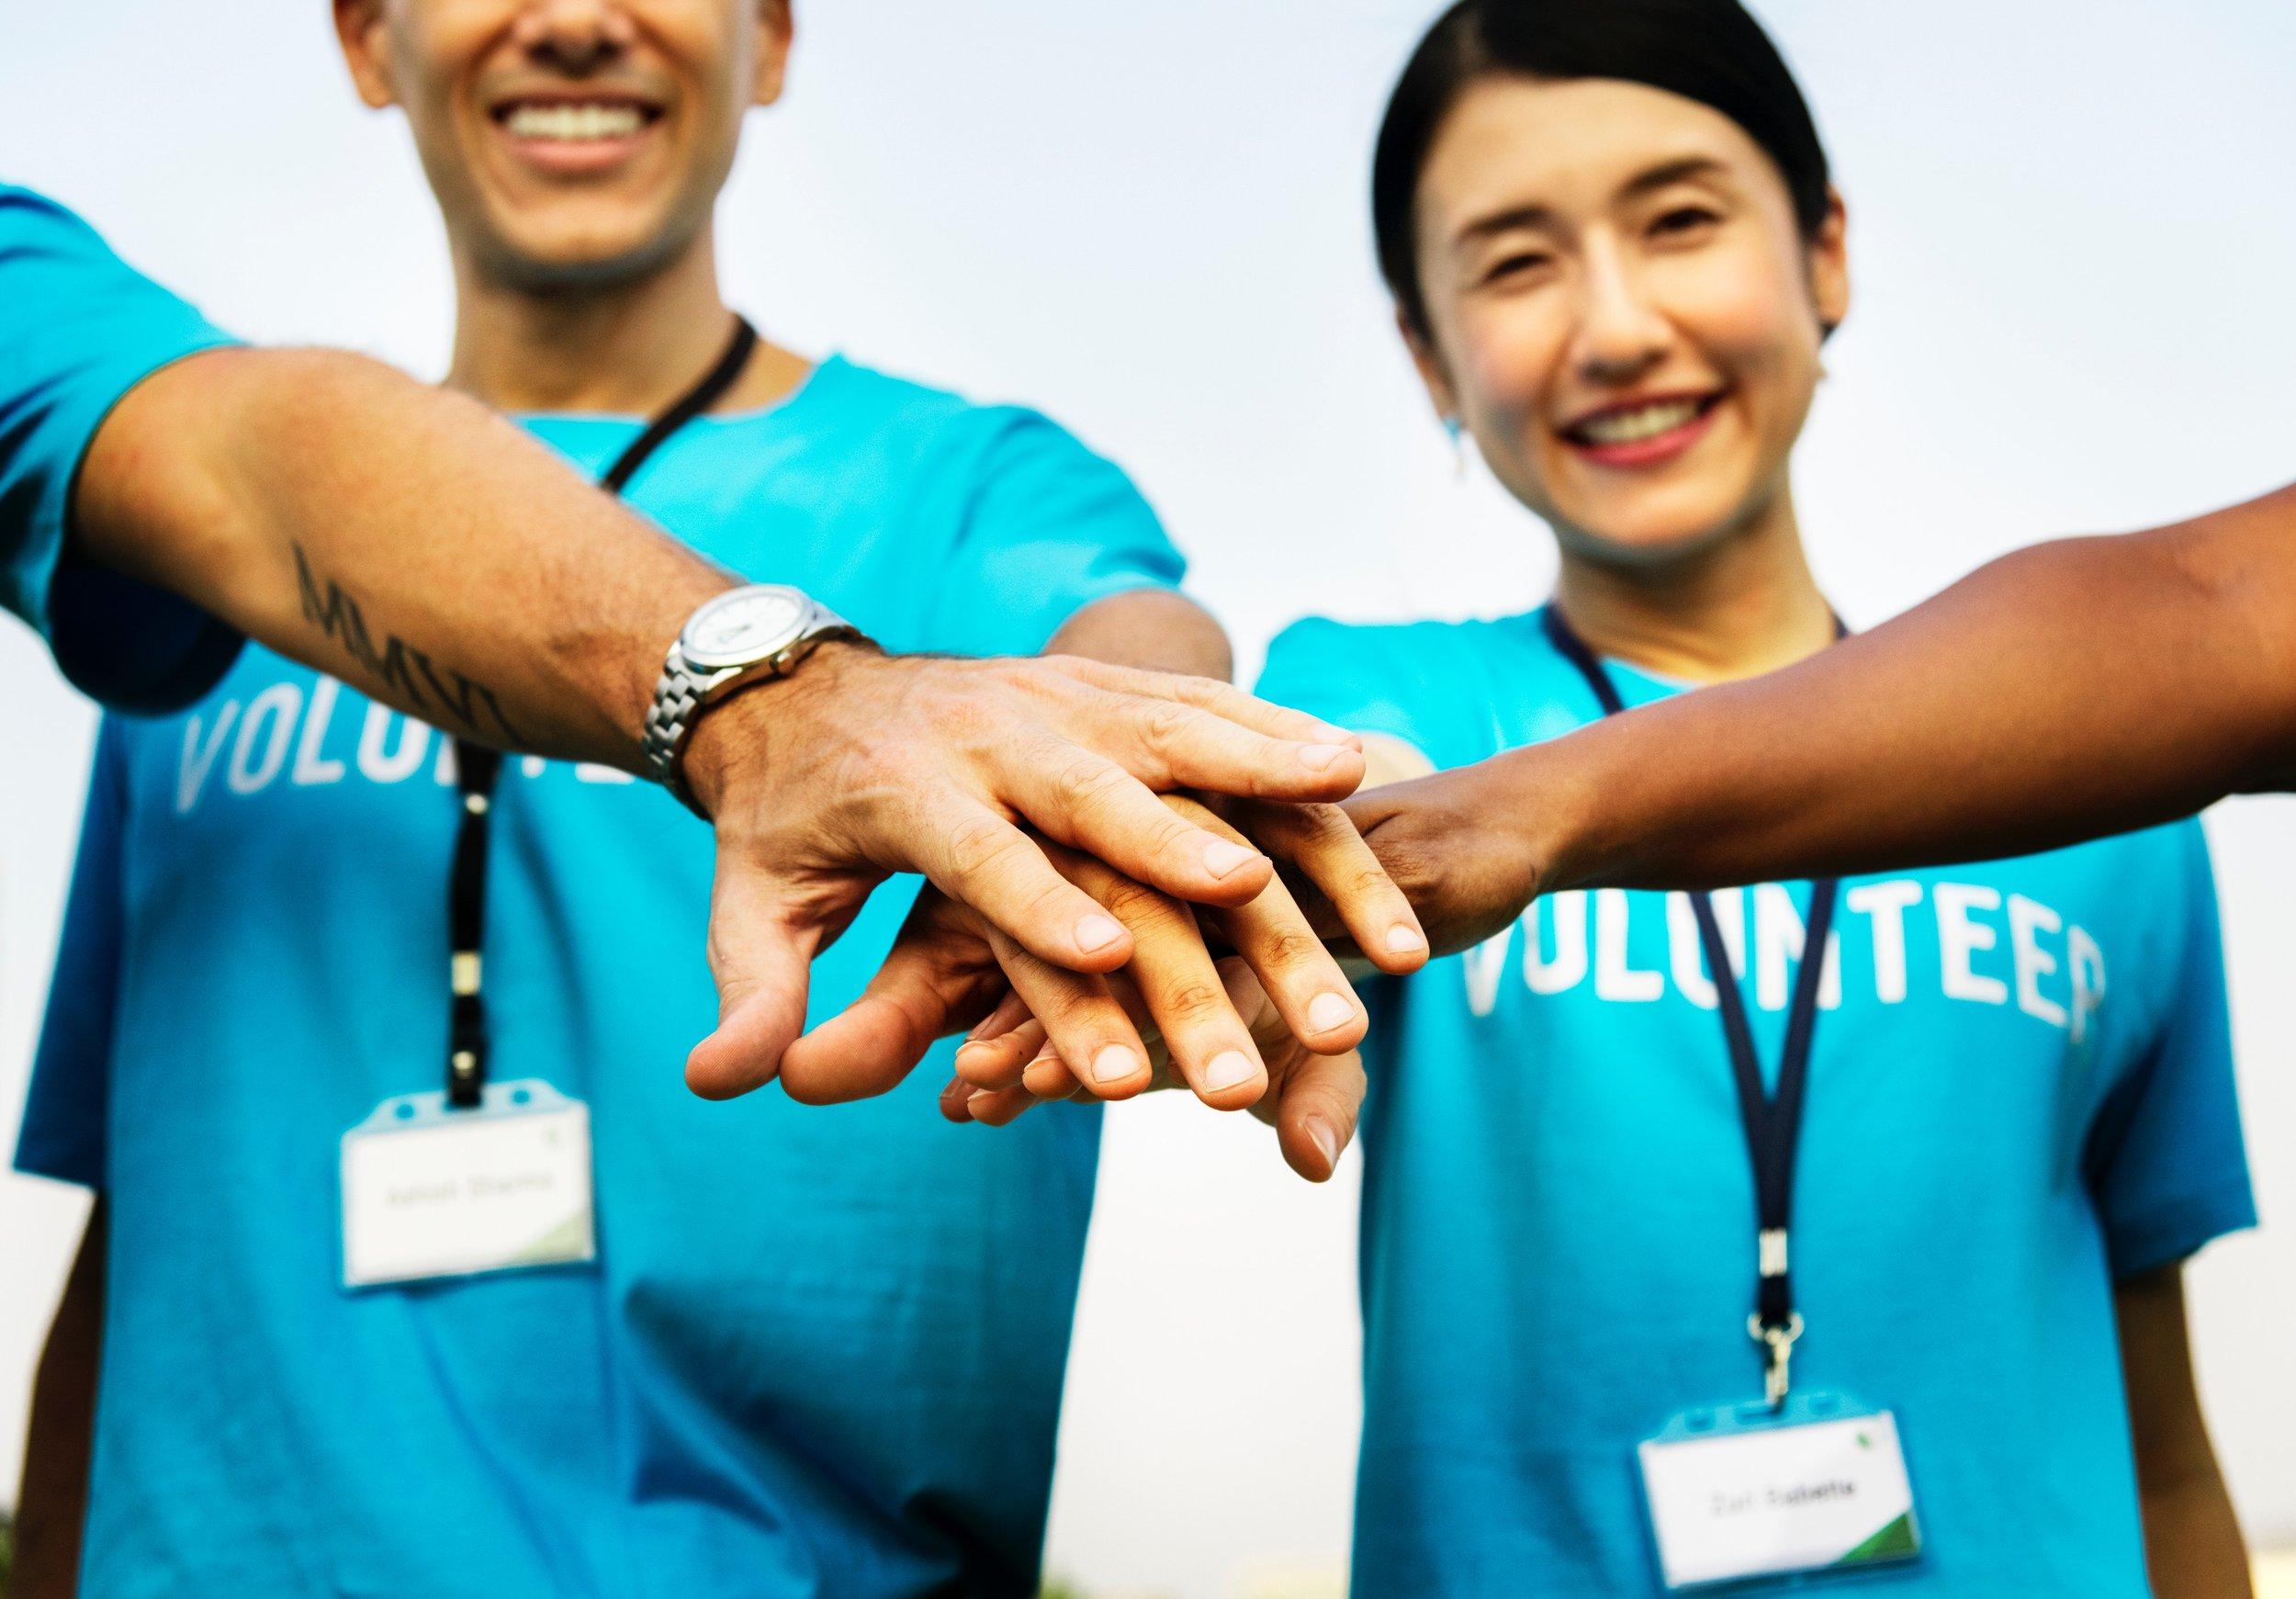 blue-charity-cheerful-1260293.jpg